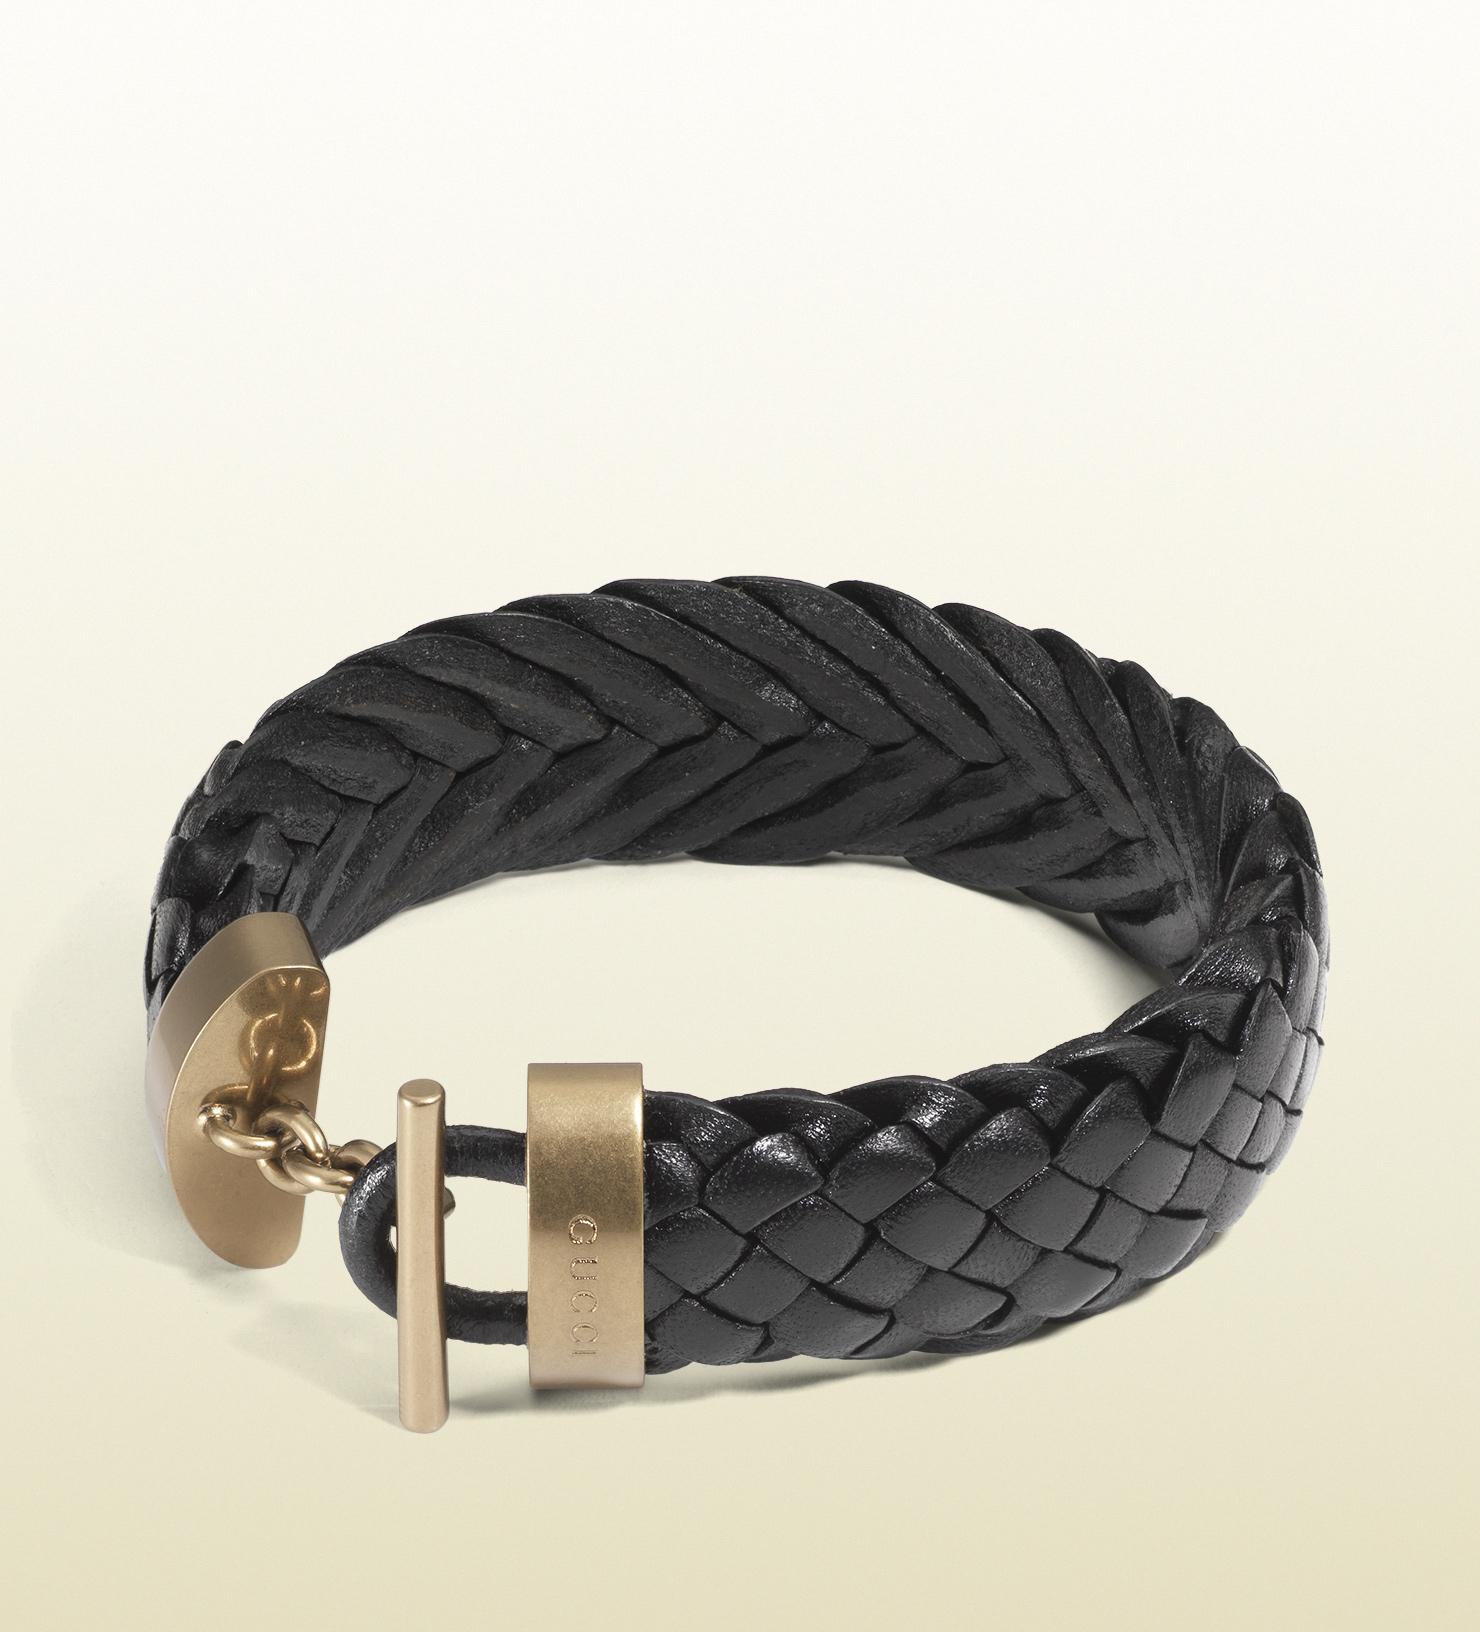 ad22cd6b6 Gucci Black Woven Leather Bracelet in Black for Men - Lyst